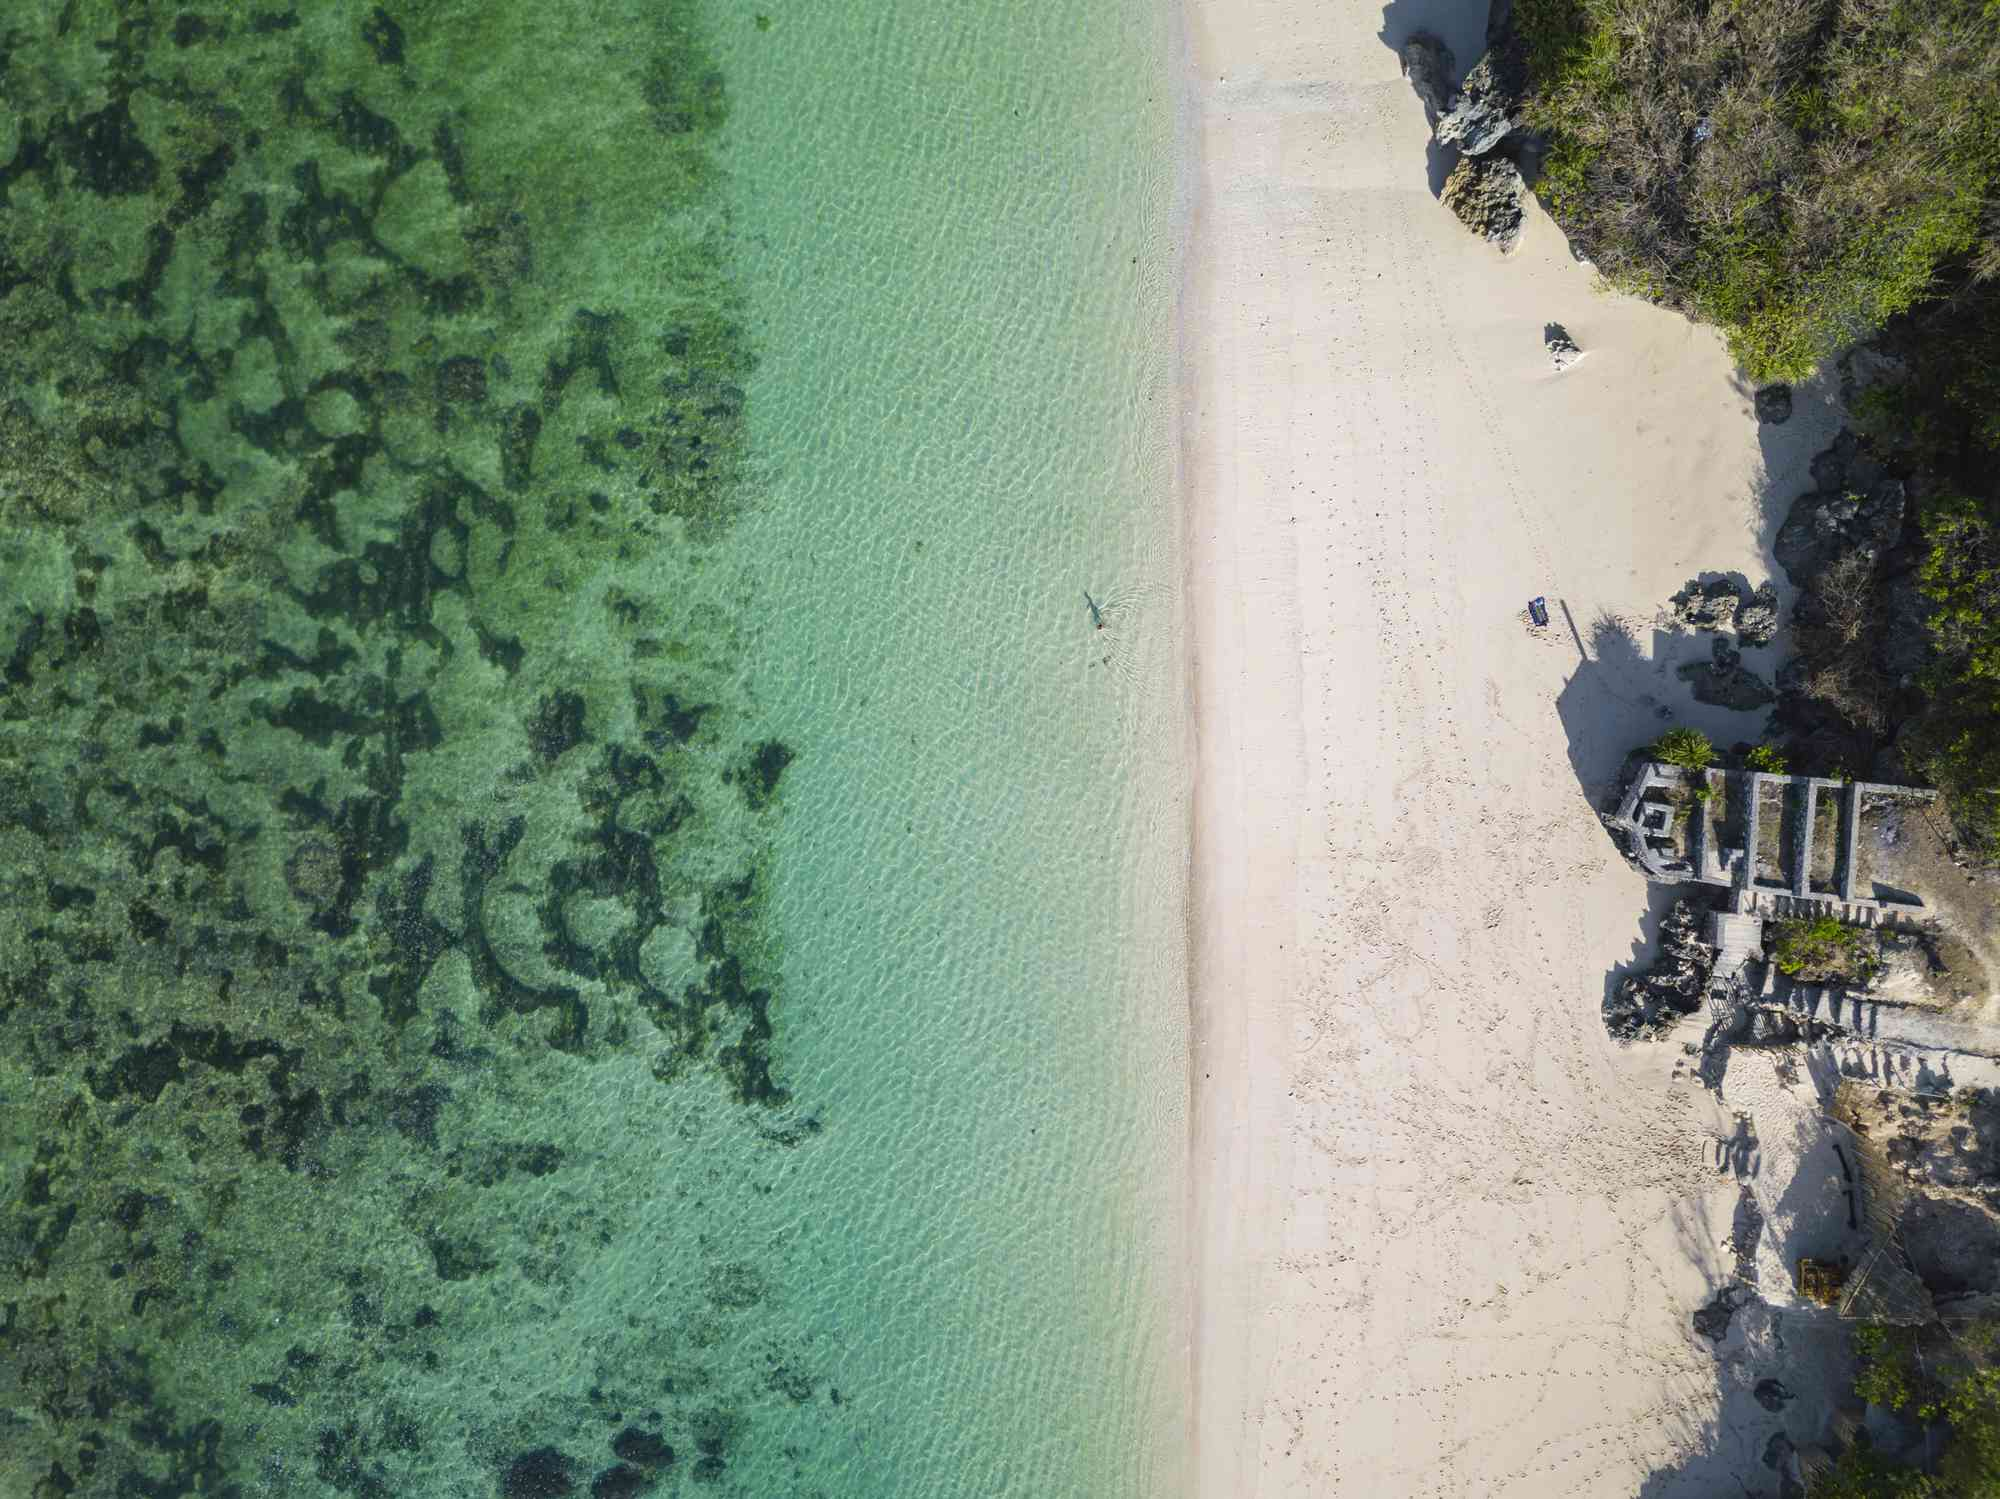 Indonesia, Bali, Aerial view of Karma Kandara beach